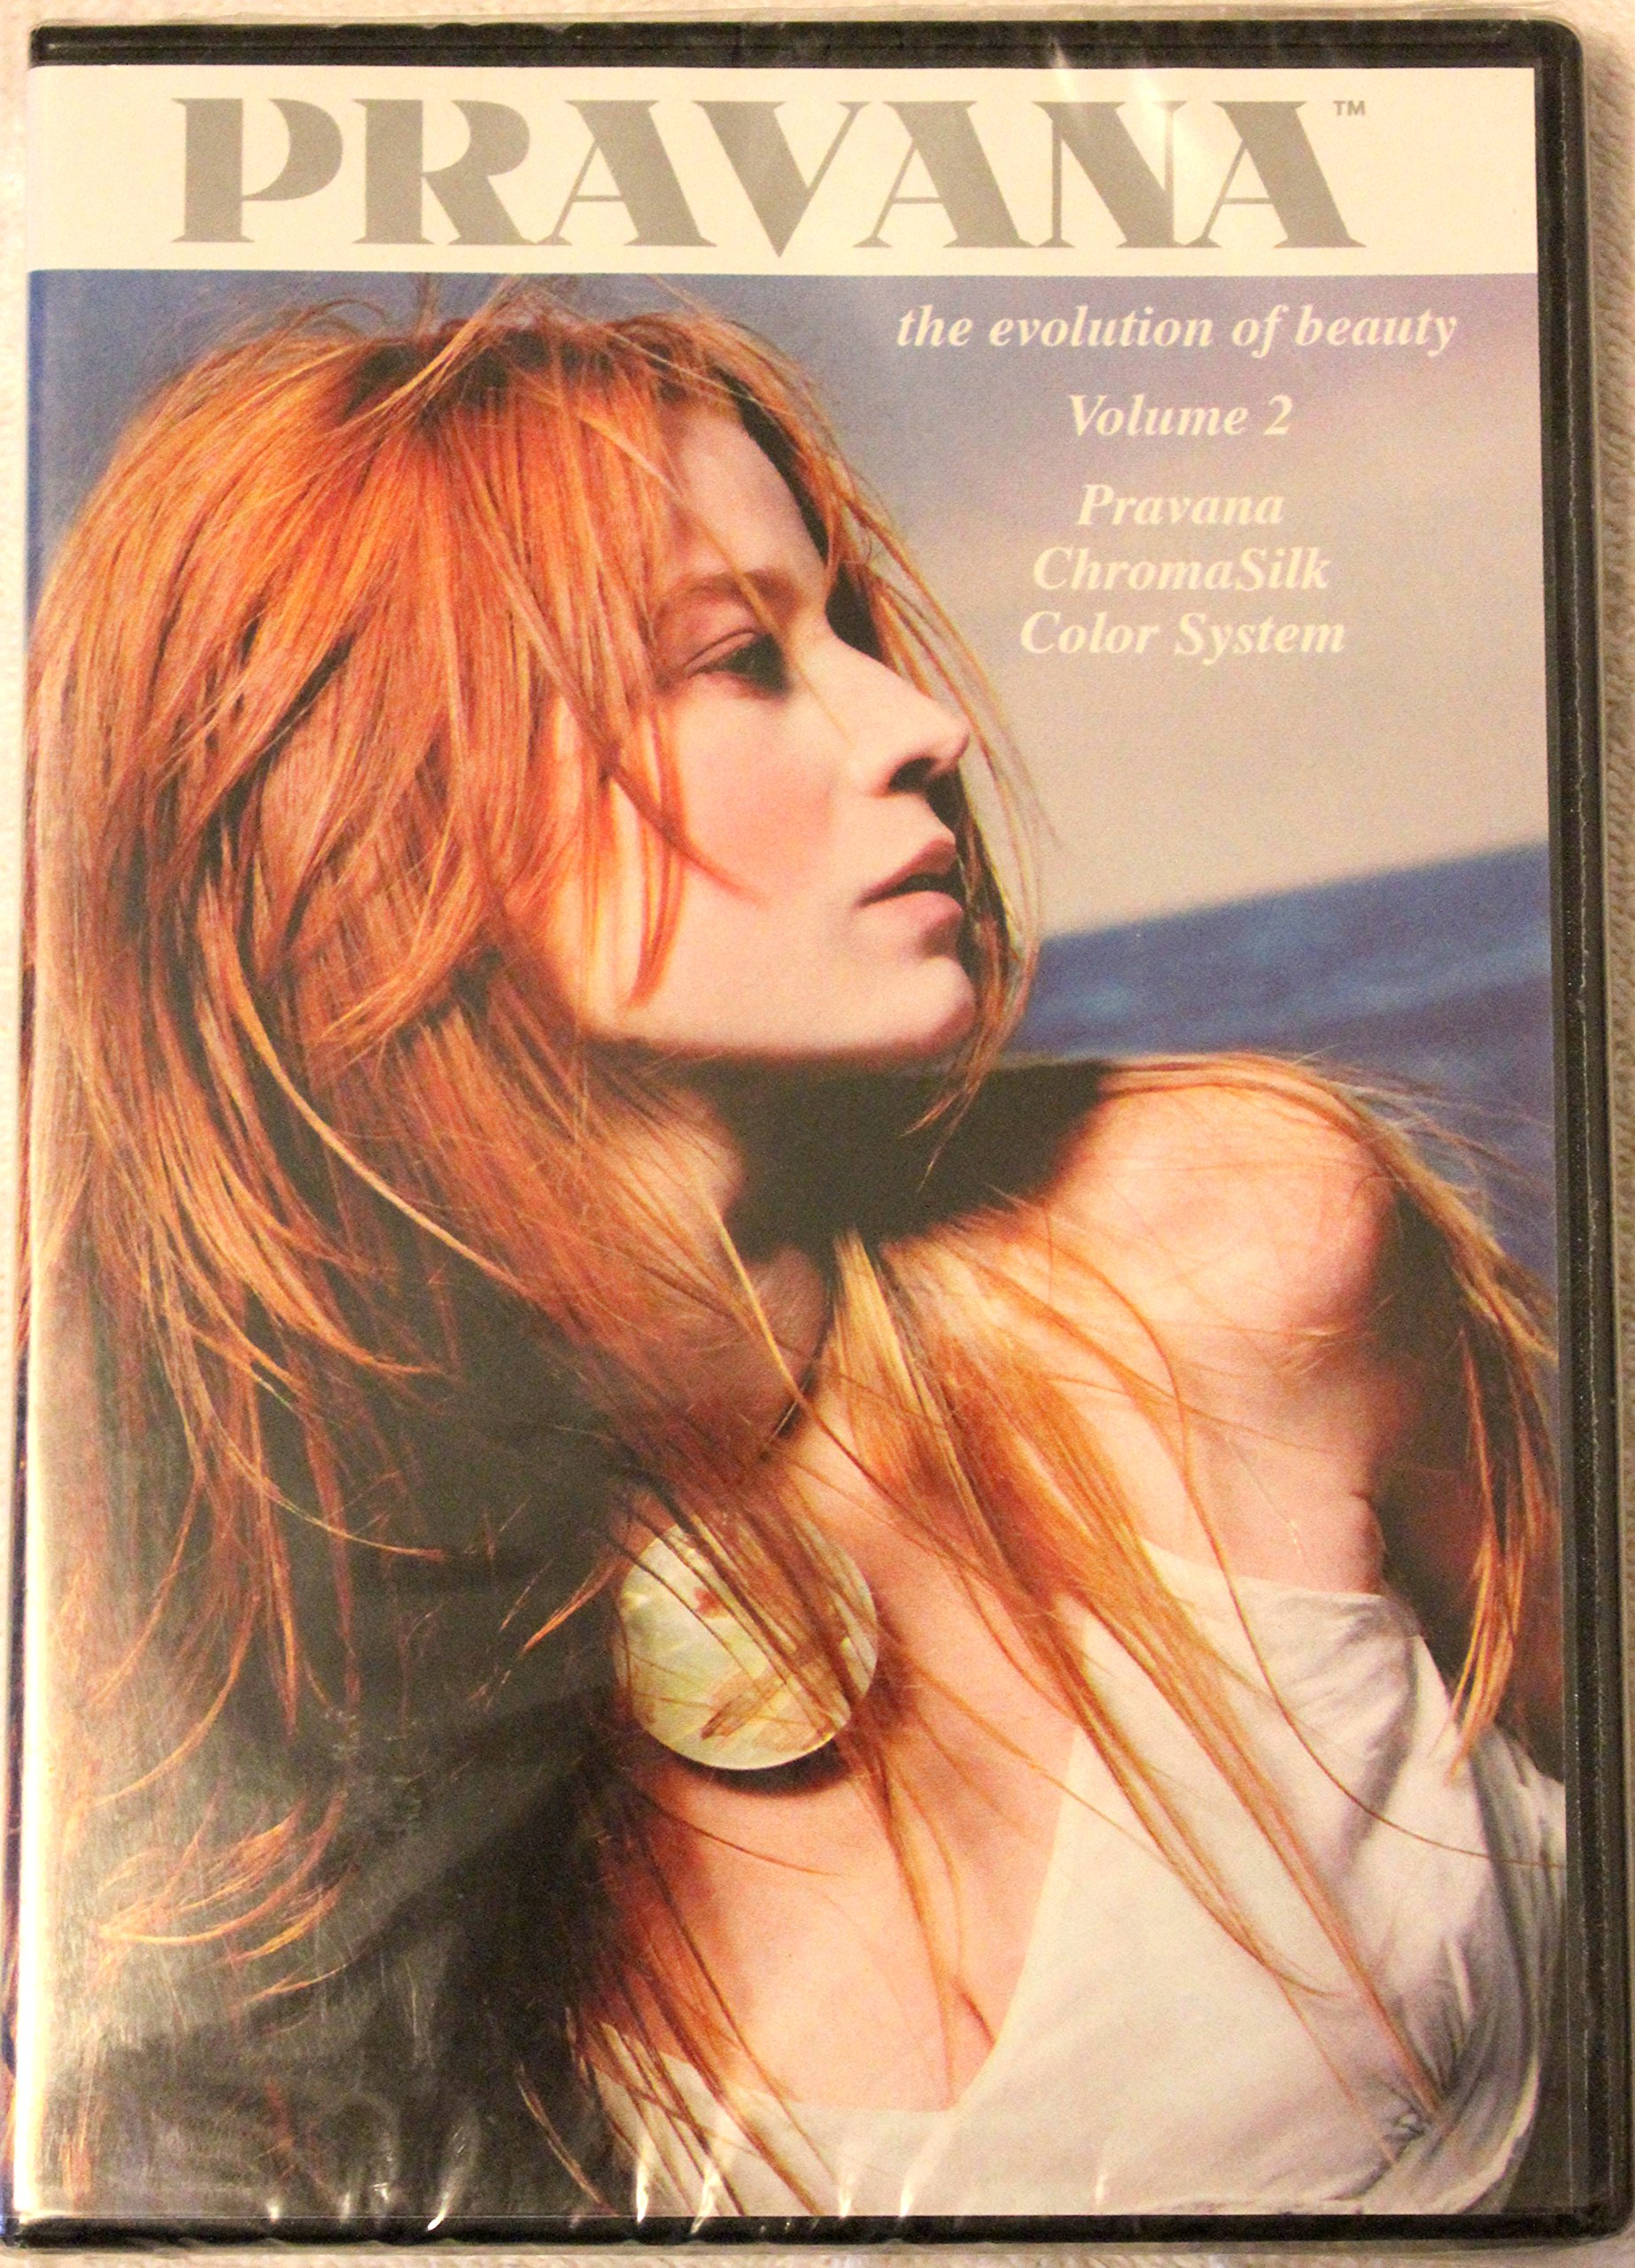 Pravana: The Evolution of Beauty Volume 2 - ChromaSilk Color System for Salons by